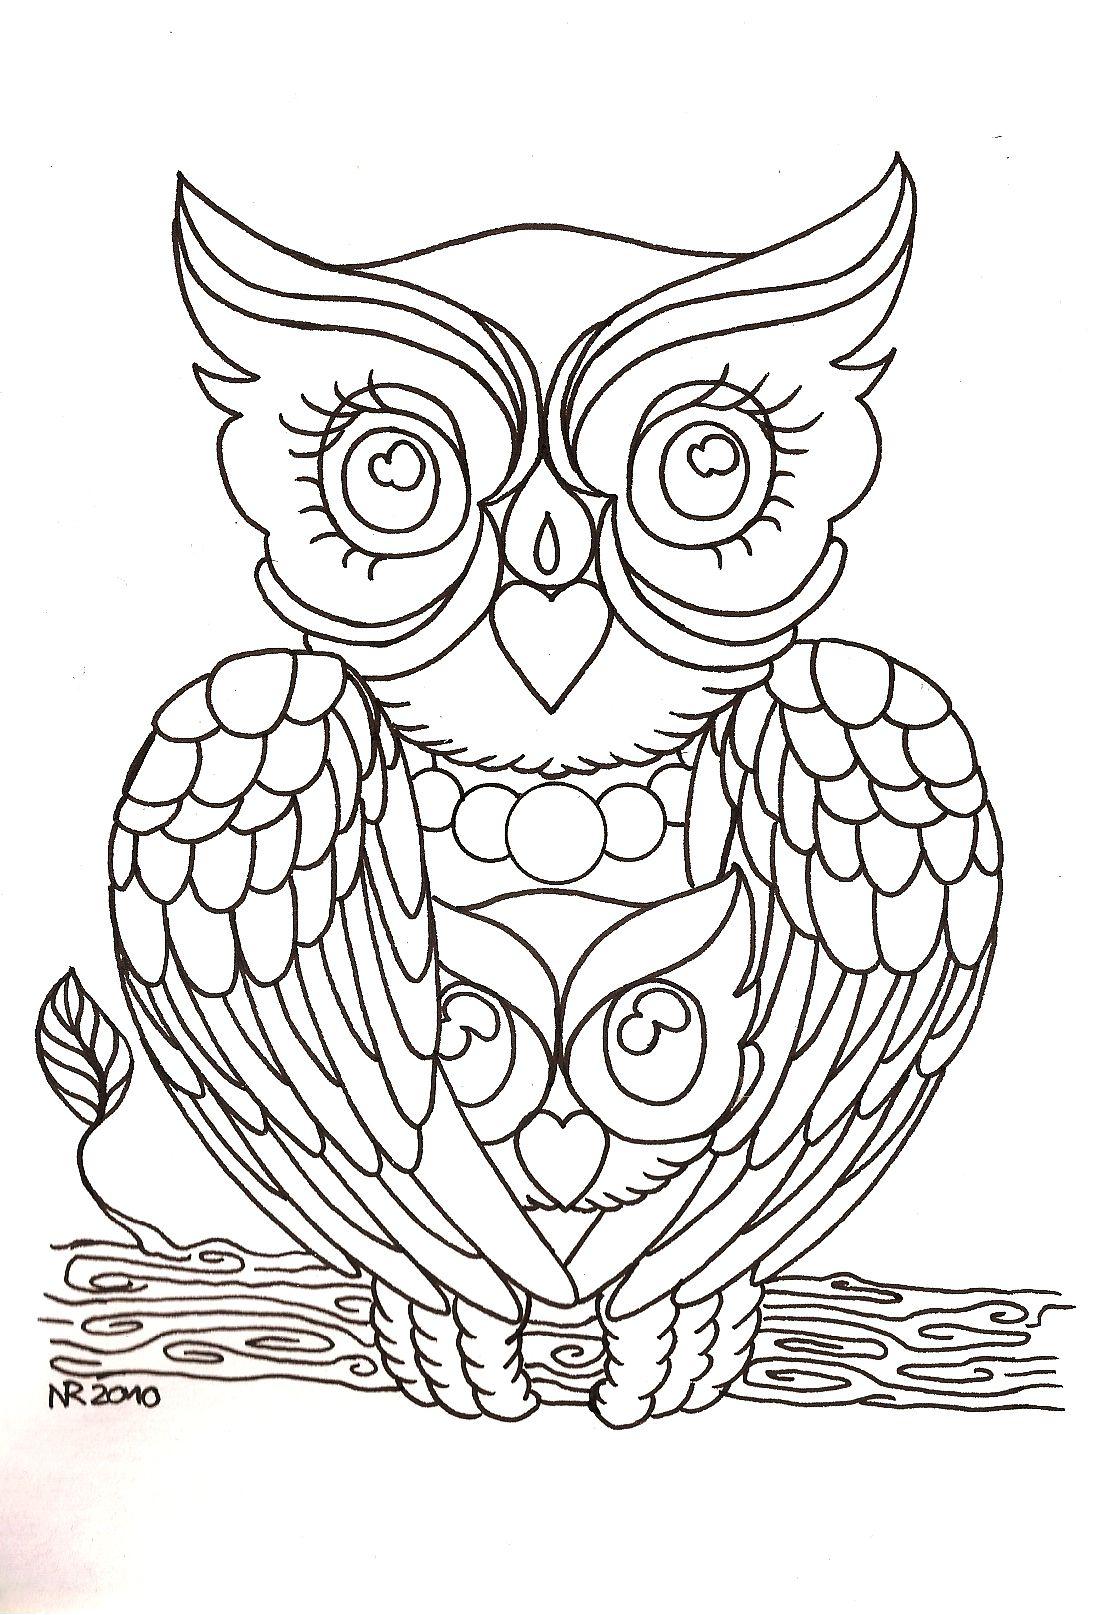 Mama_Owl_by_MahakaliCreation.jpg (1100×1615) | Mandalas | Pinterest ...